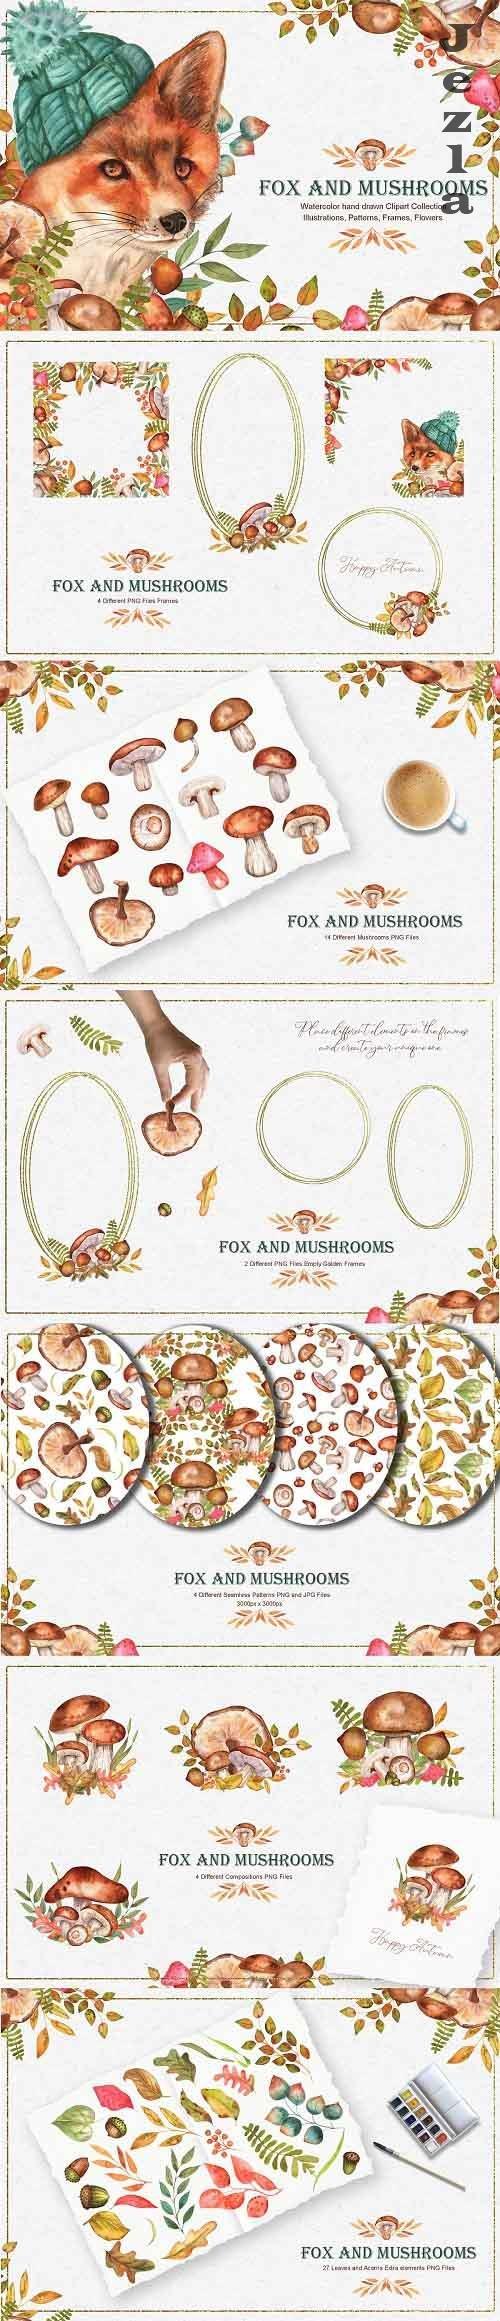 Fox and Mushrooms Watercolor Set - 5478573